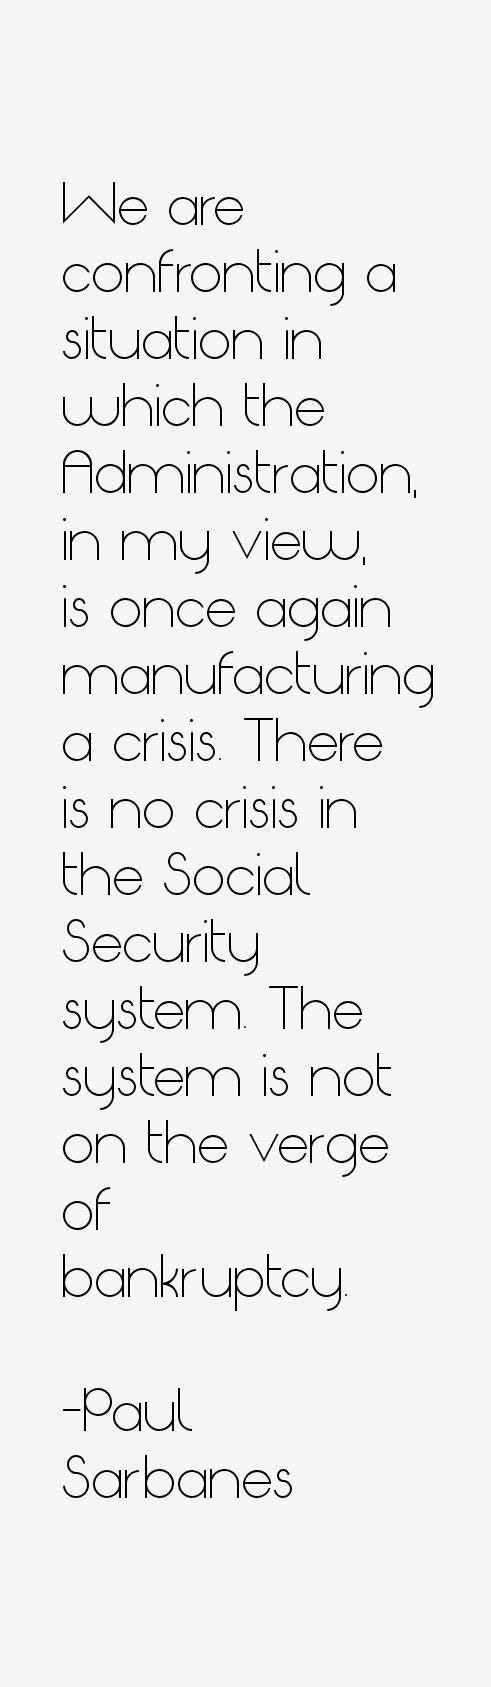 Paul Sarbanes Quotes